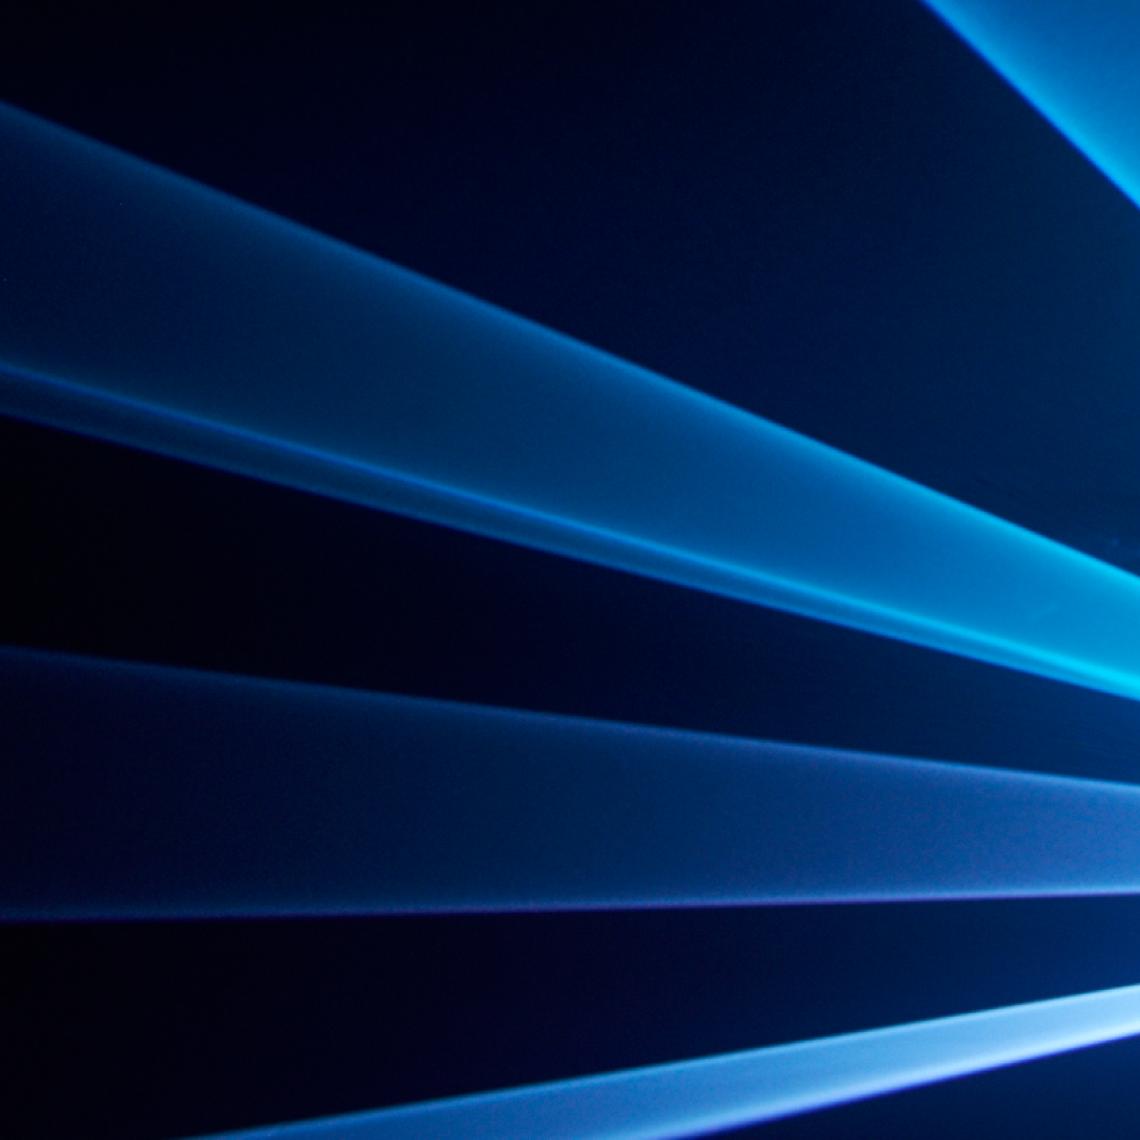 Windows Imagery